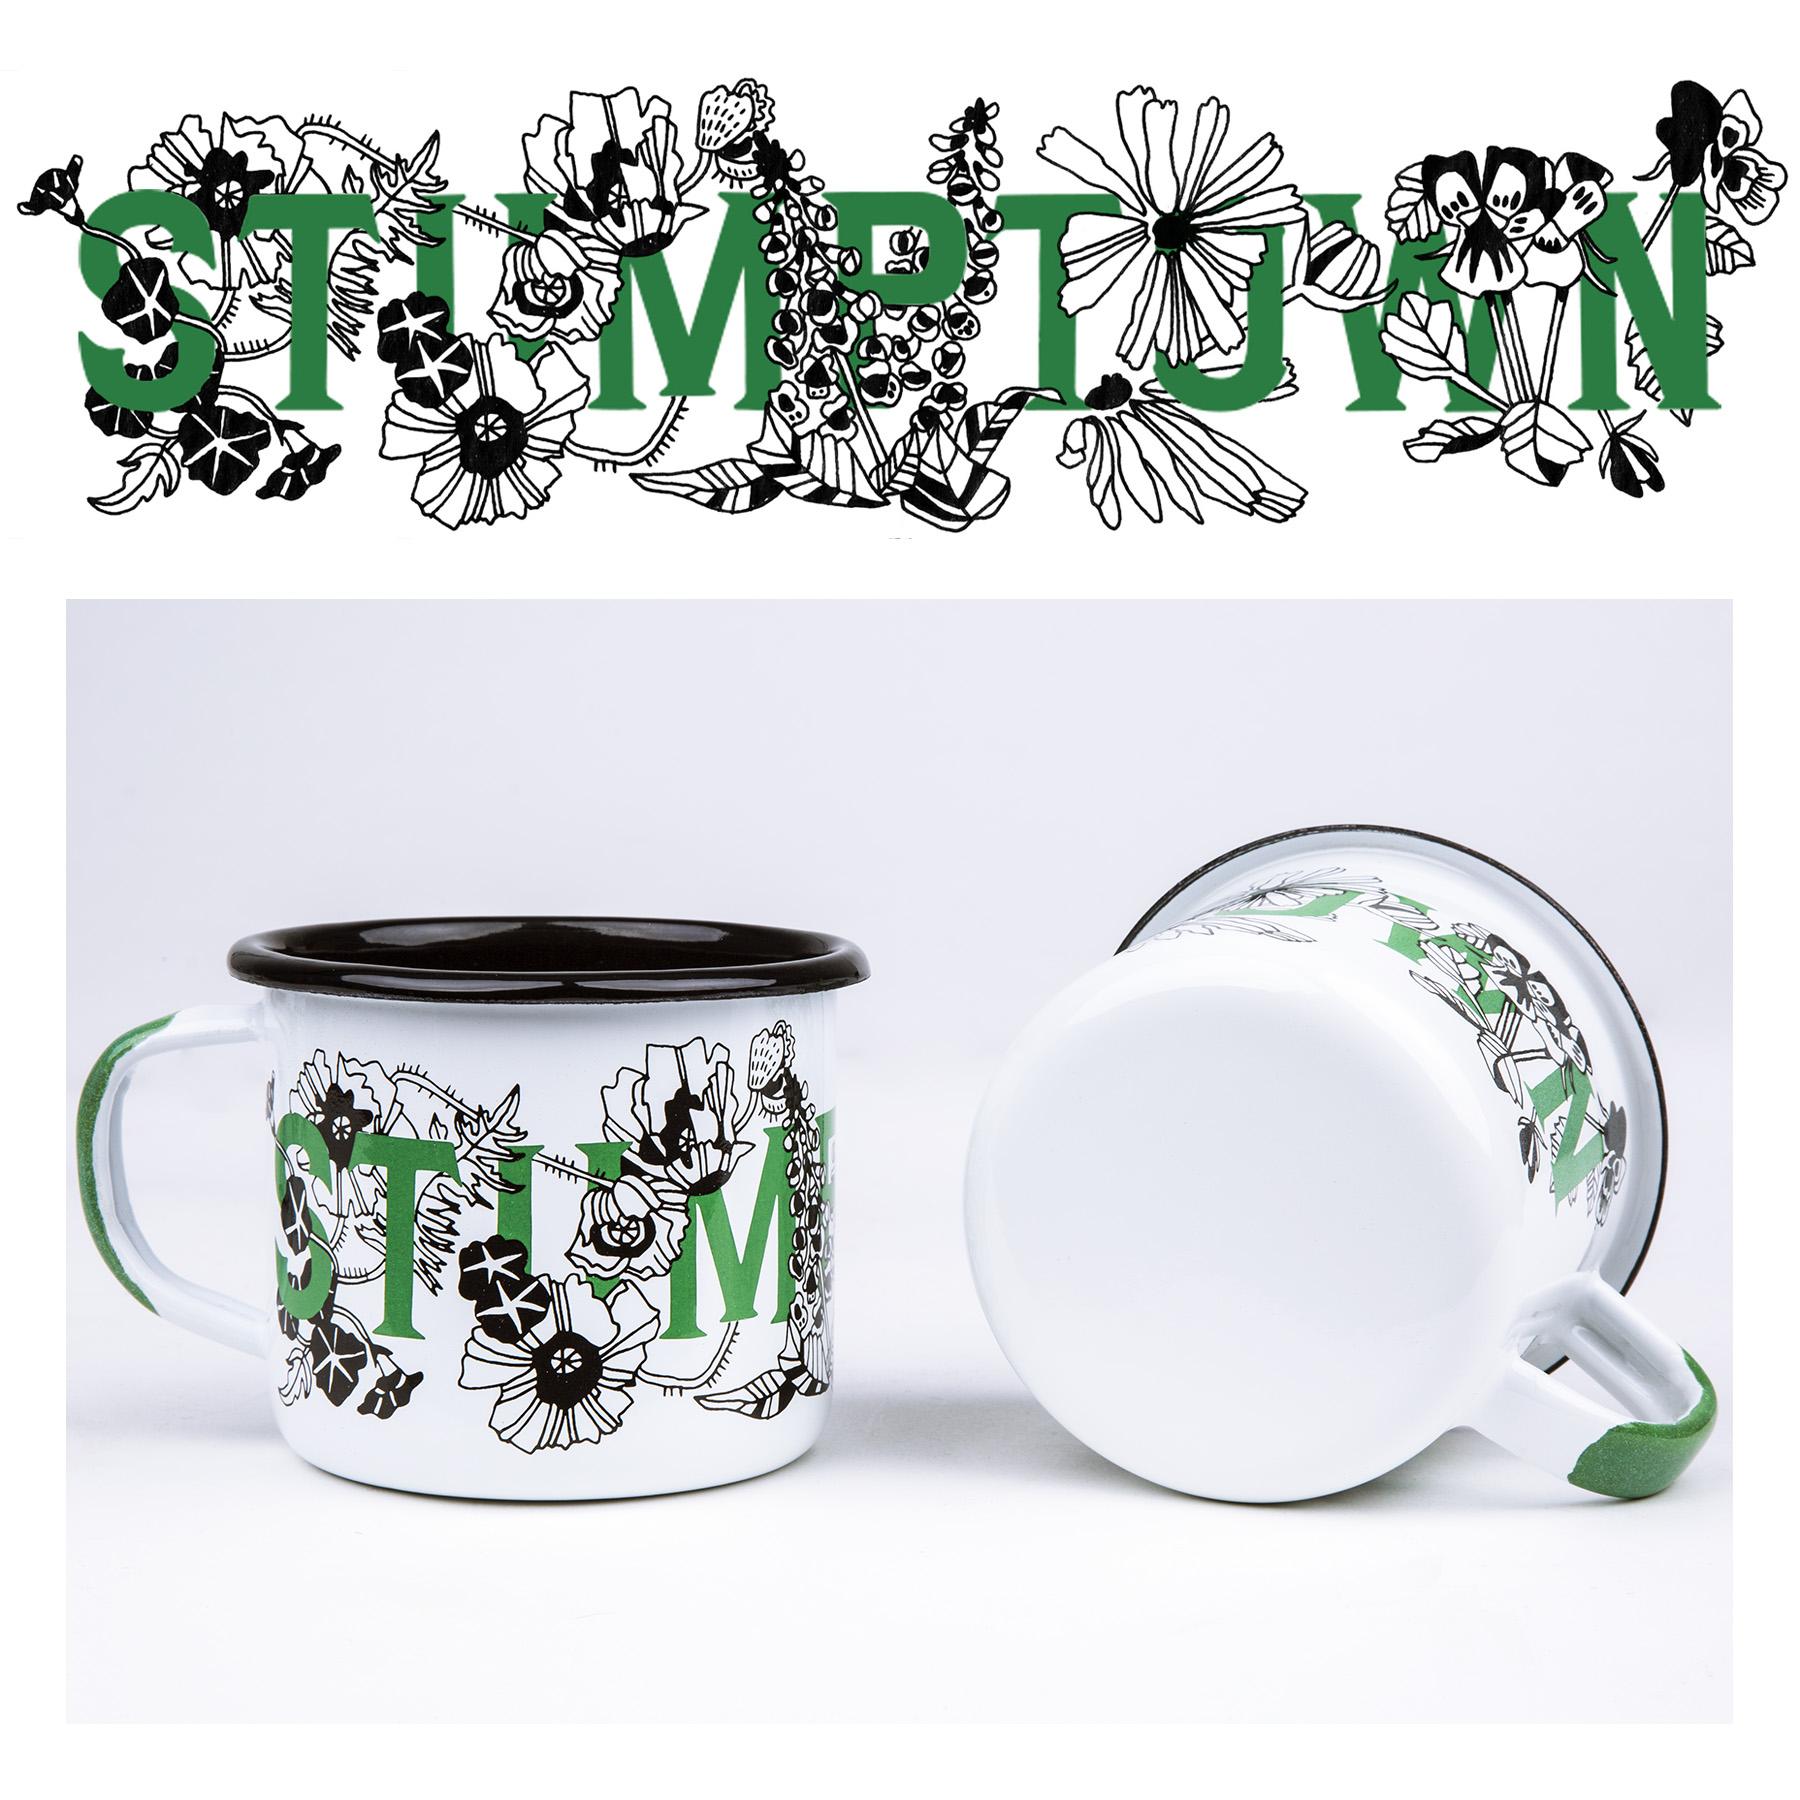 stumptown mug insta.jpg